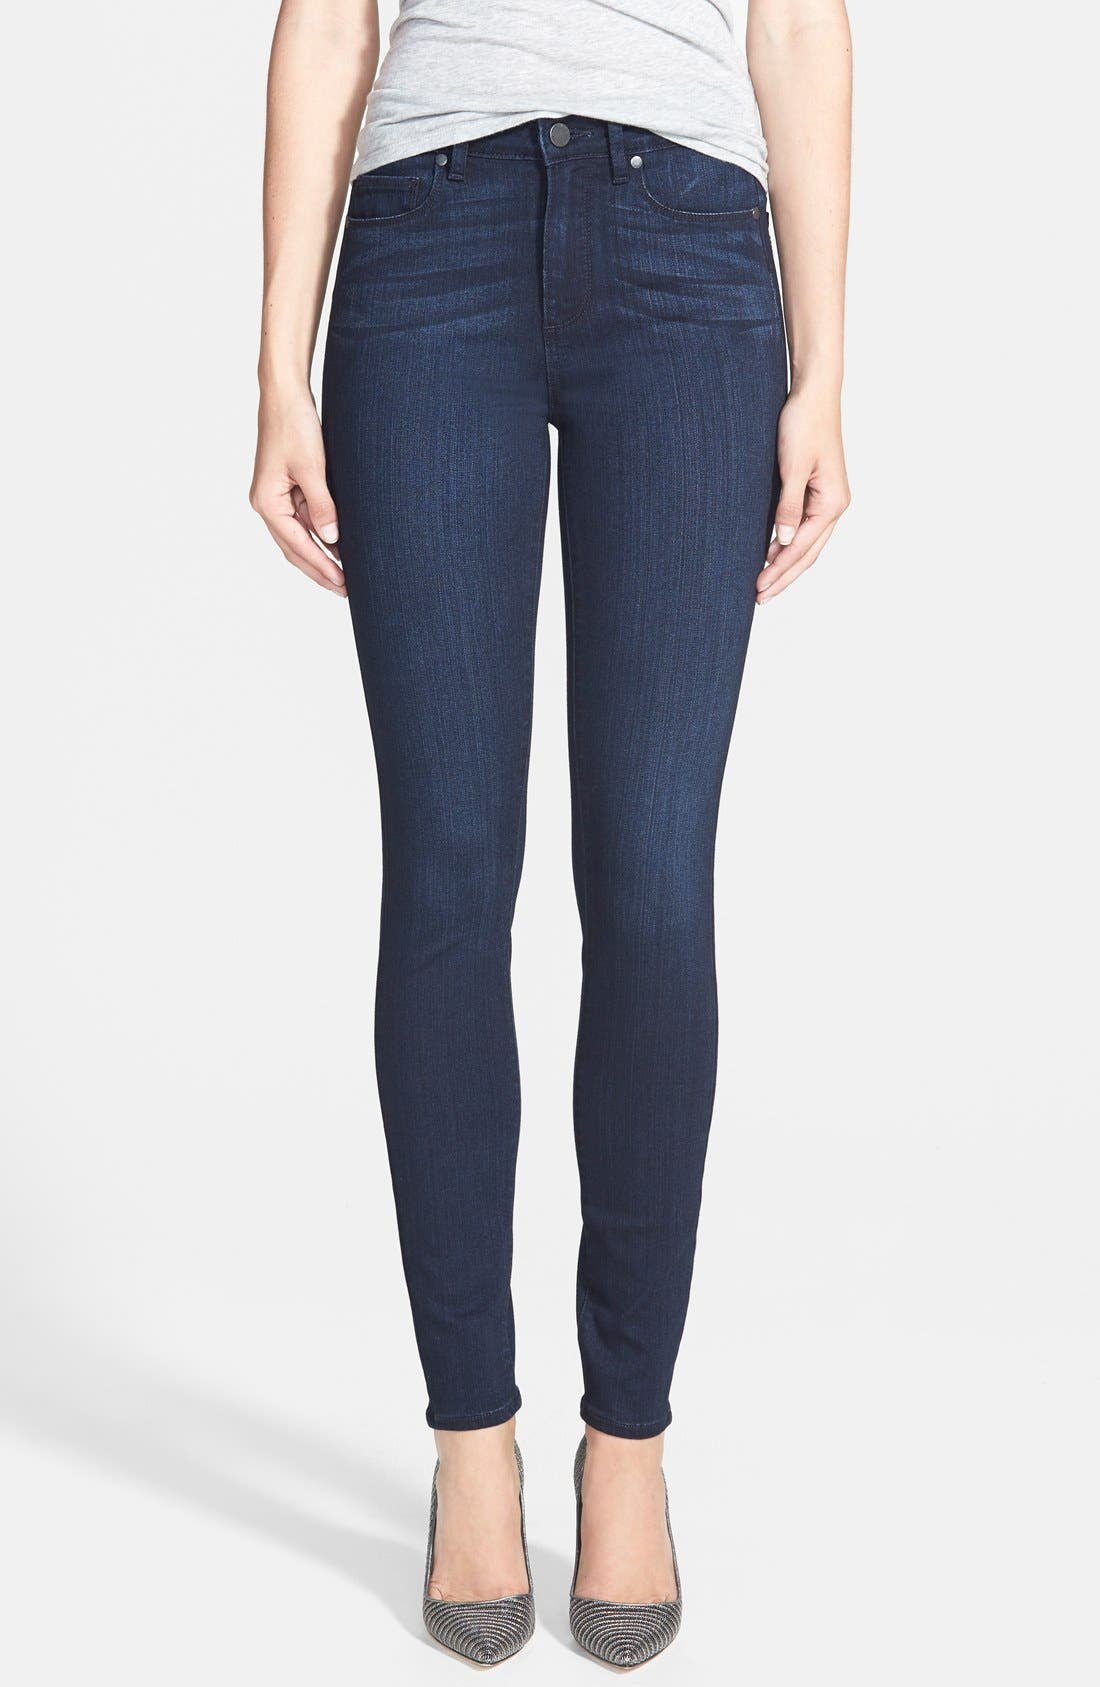 Denim 'Transcend - Hoxton' High Rise Ultra Skinny Jeans,                         Main,                         color, 400